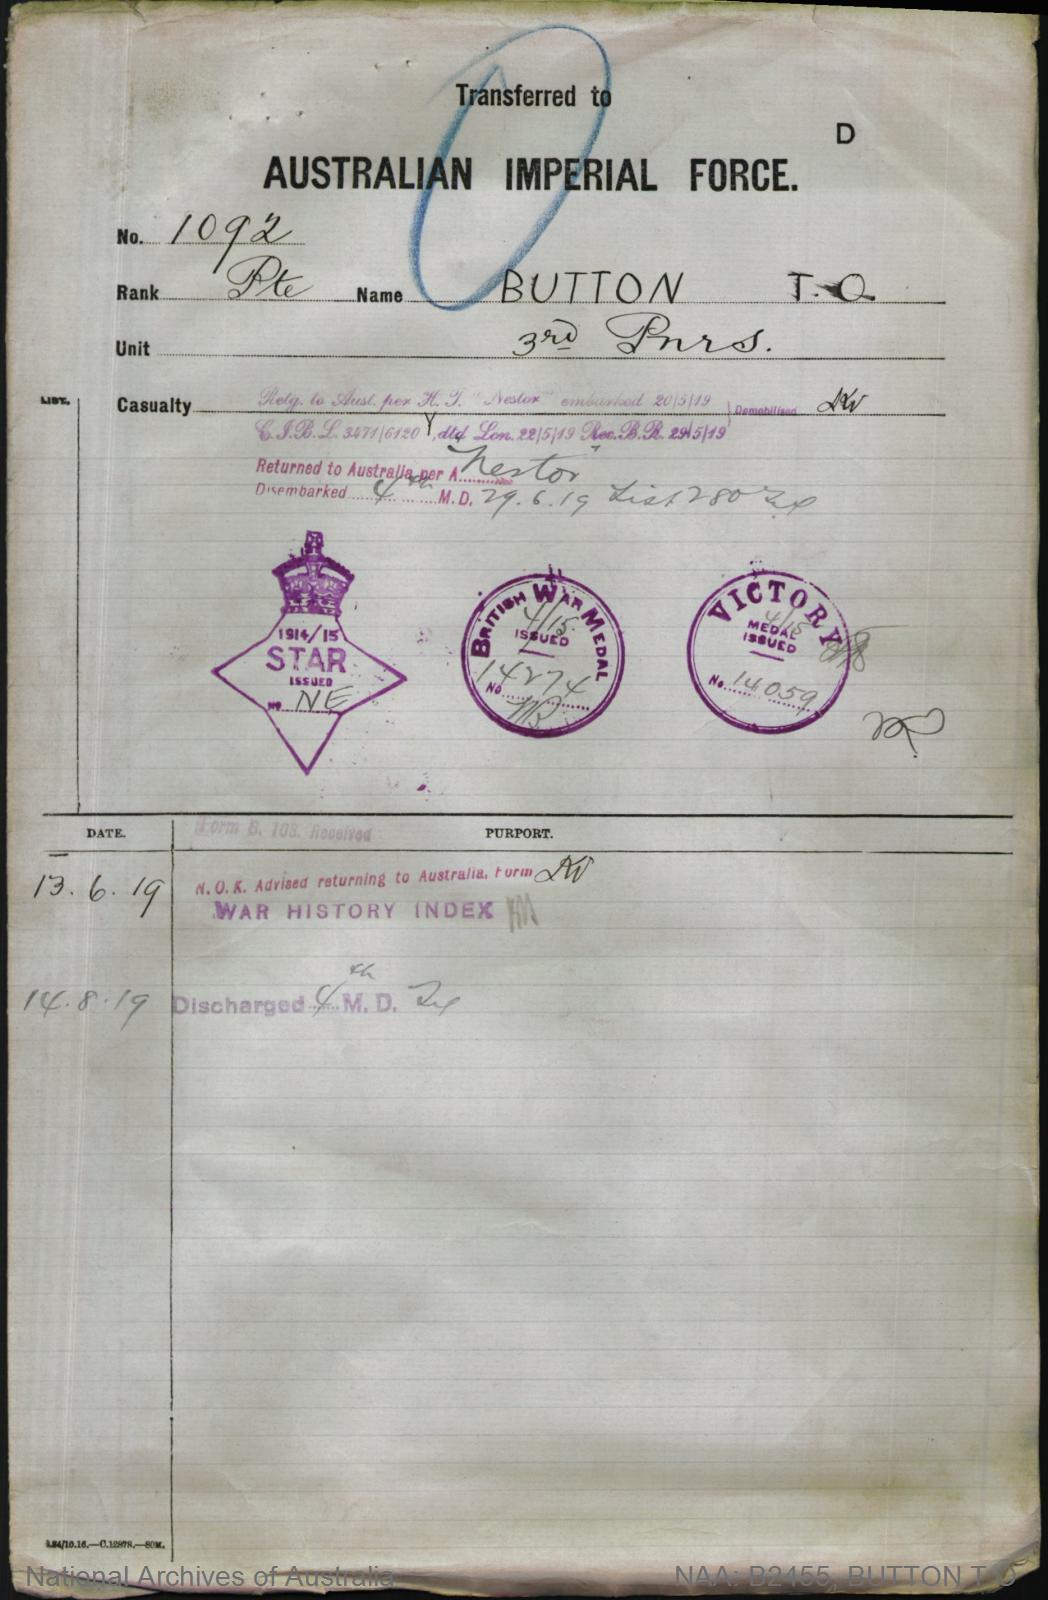 Button Theodore Orlando : SERN 1092 : POB Minlaton SA : POE Adelaide SA : NOK M Button Elizabeth